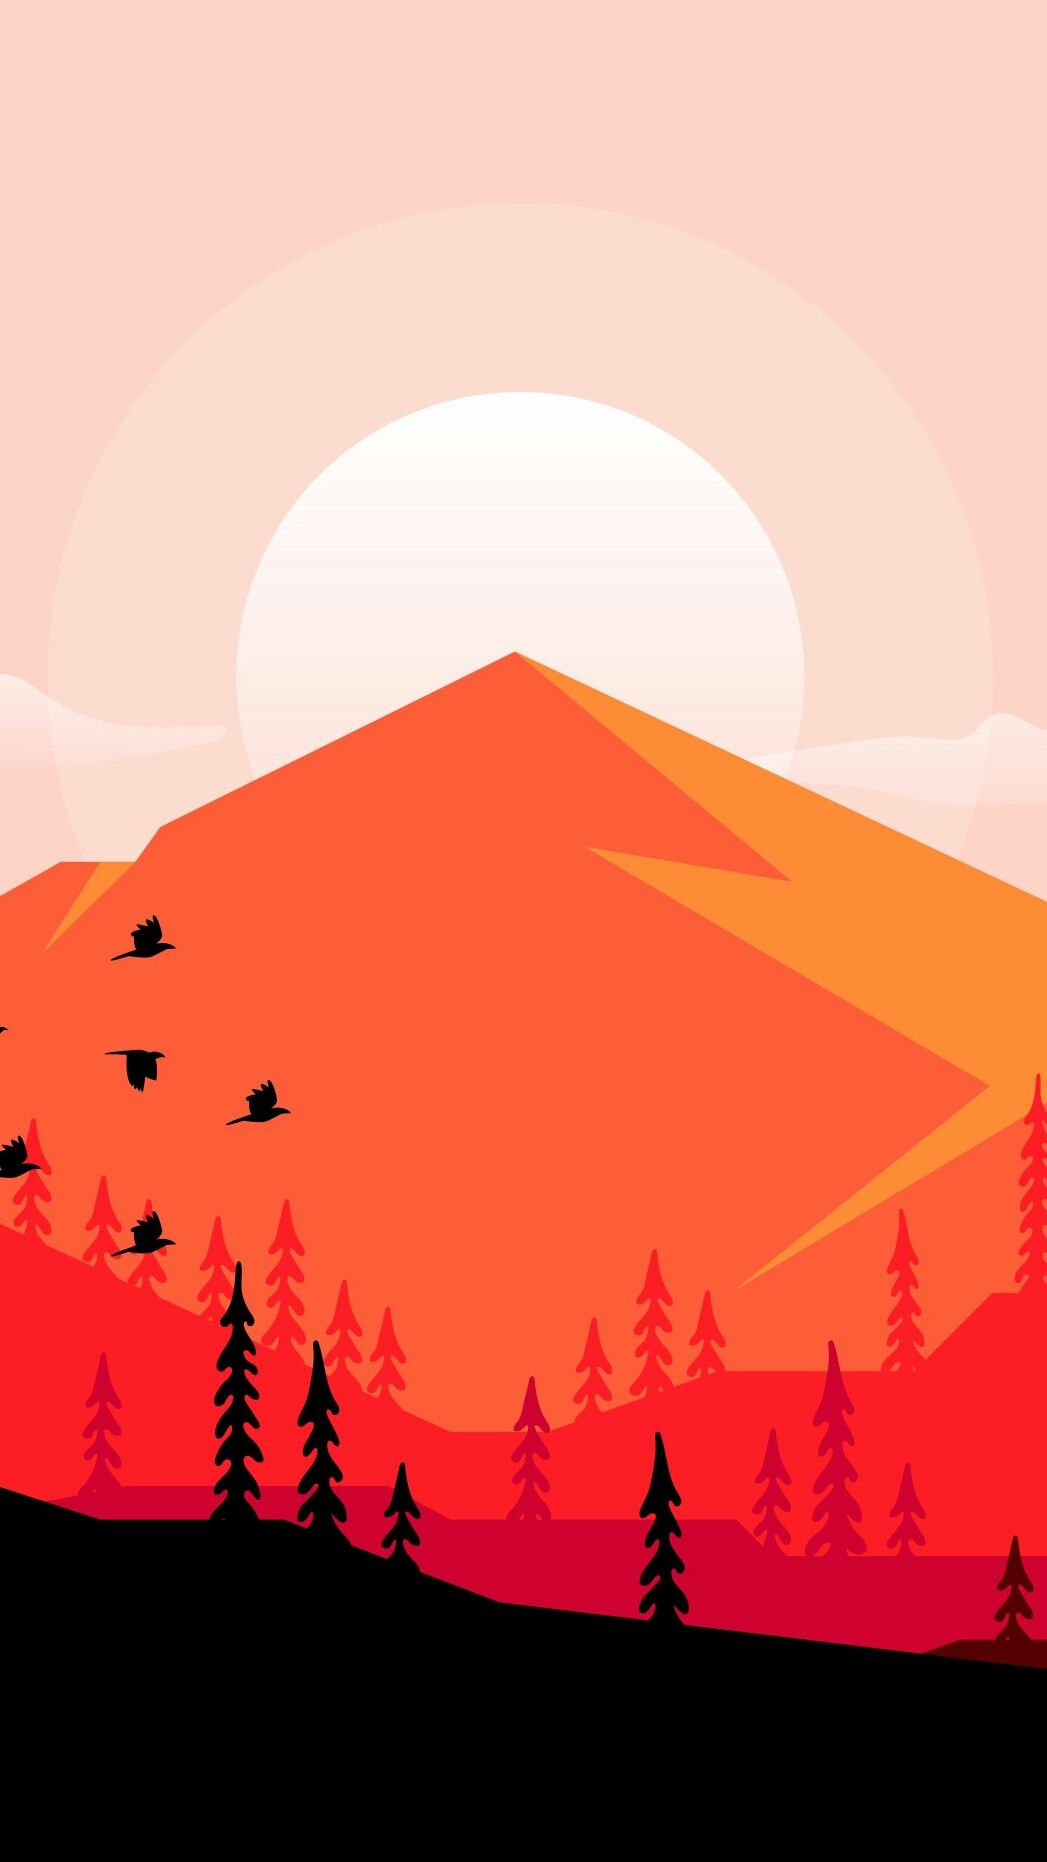 Fantastic Wallpaper Mountain Pattern - 216a1cef0aa6f091a1ed1502cc16fa29  Photograph_2902.jpg